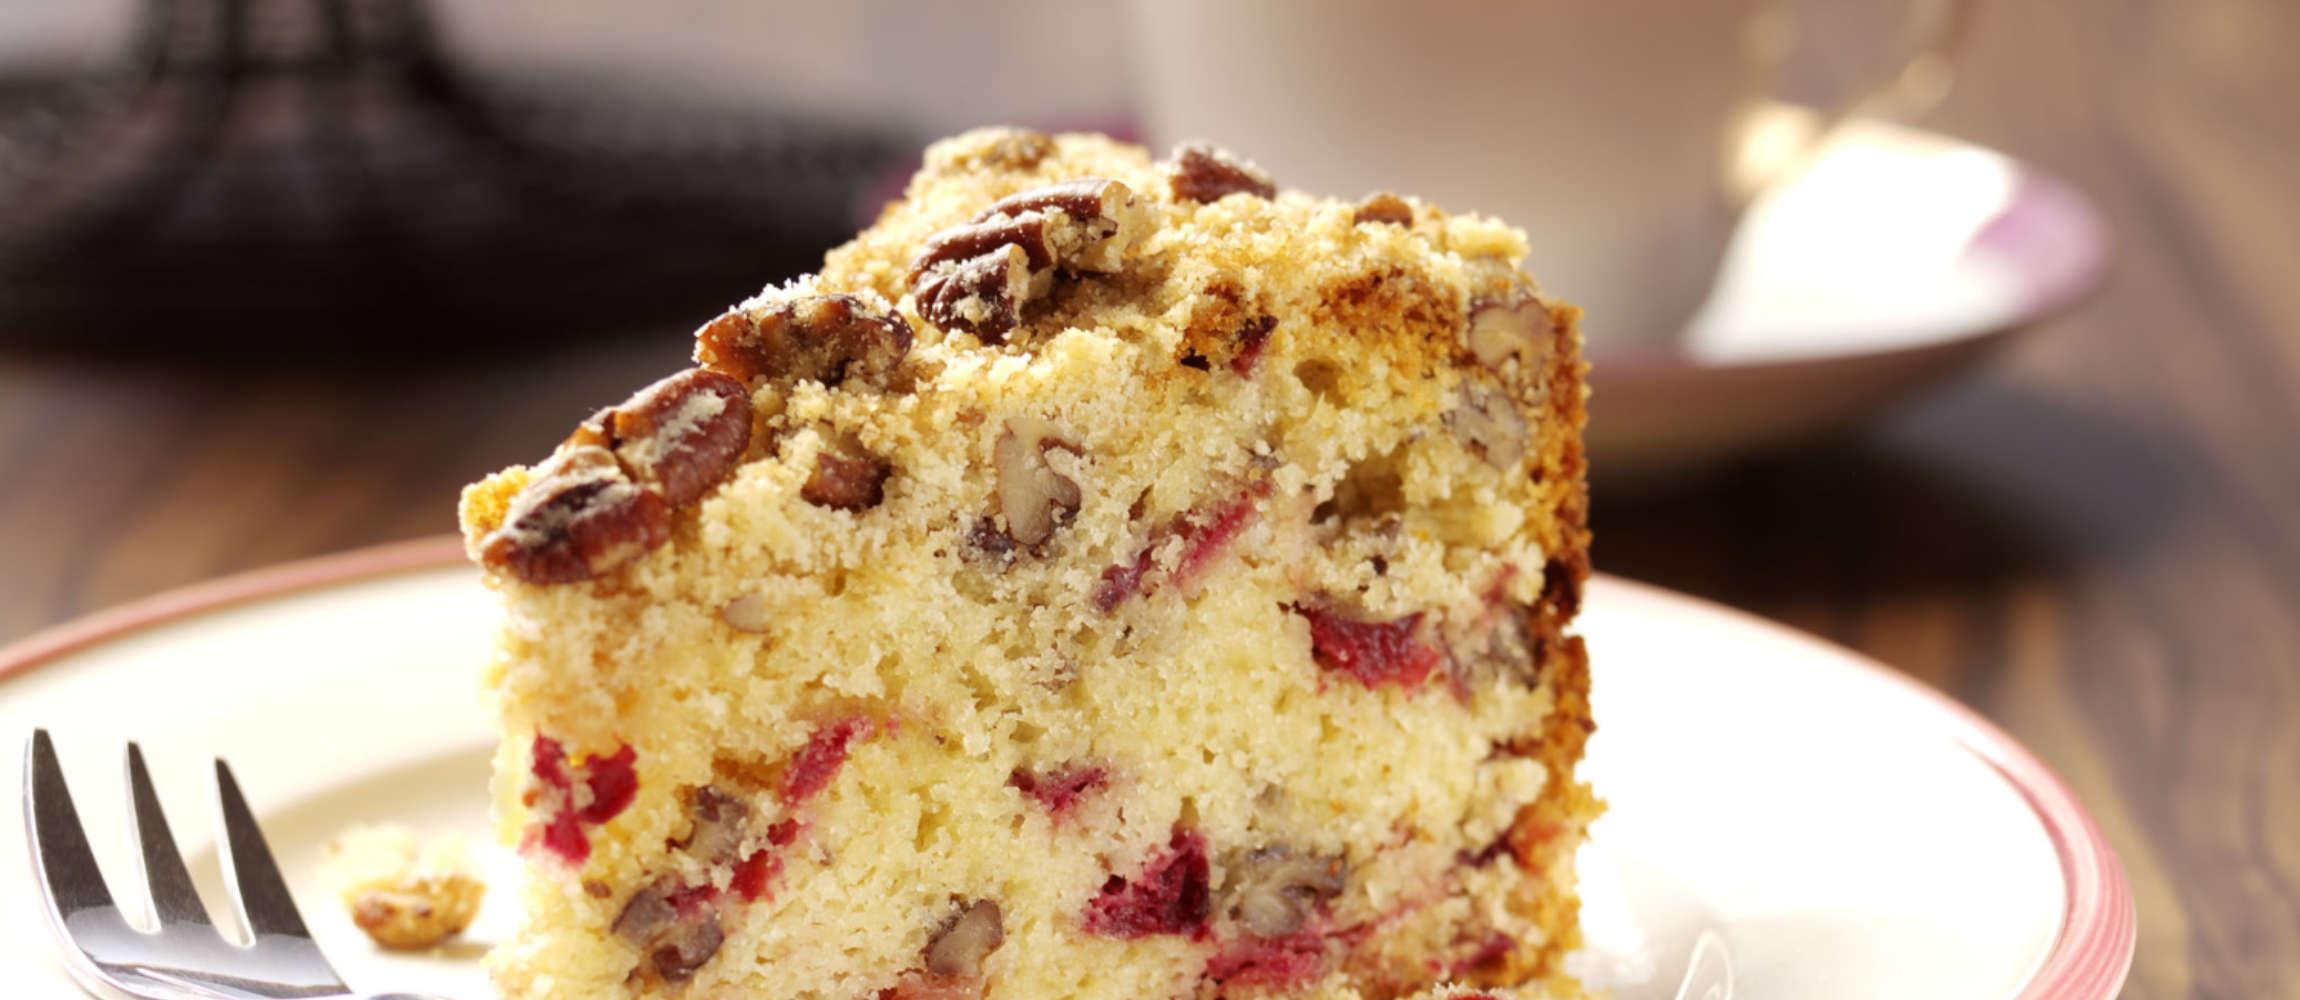 Hive Cake Tin